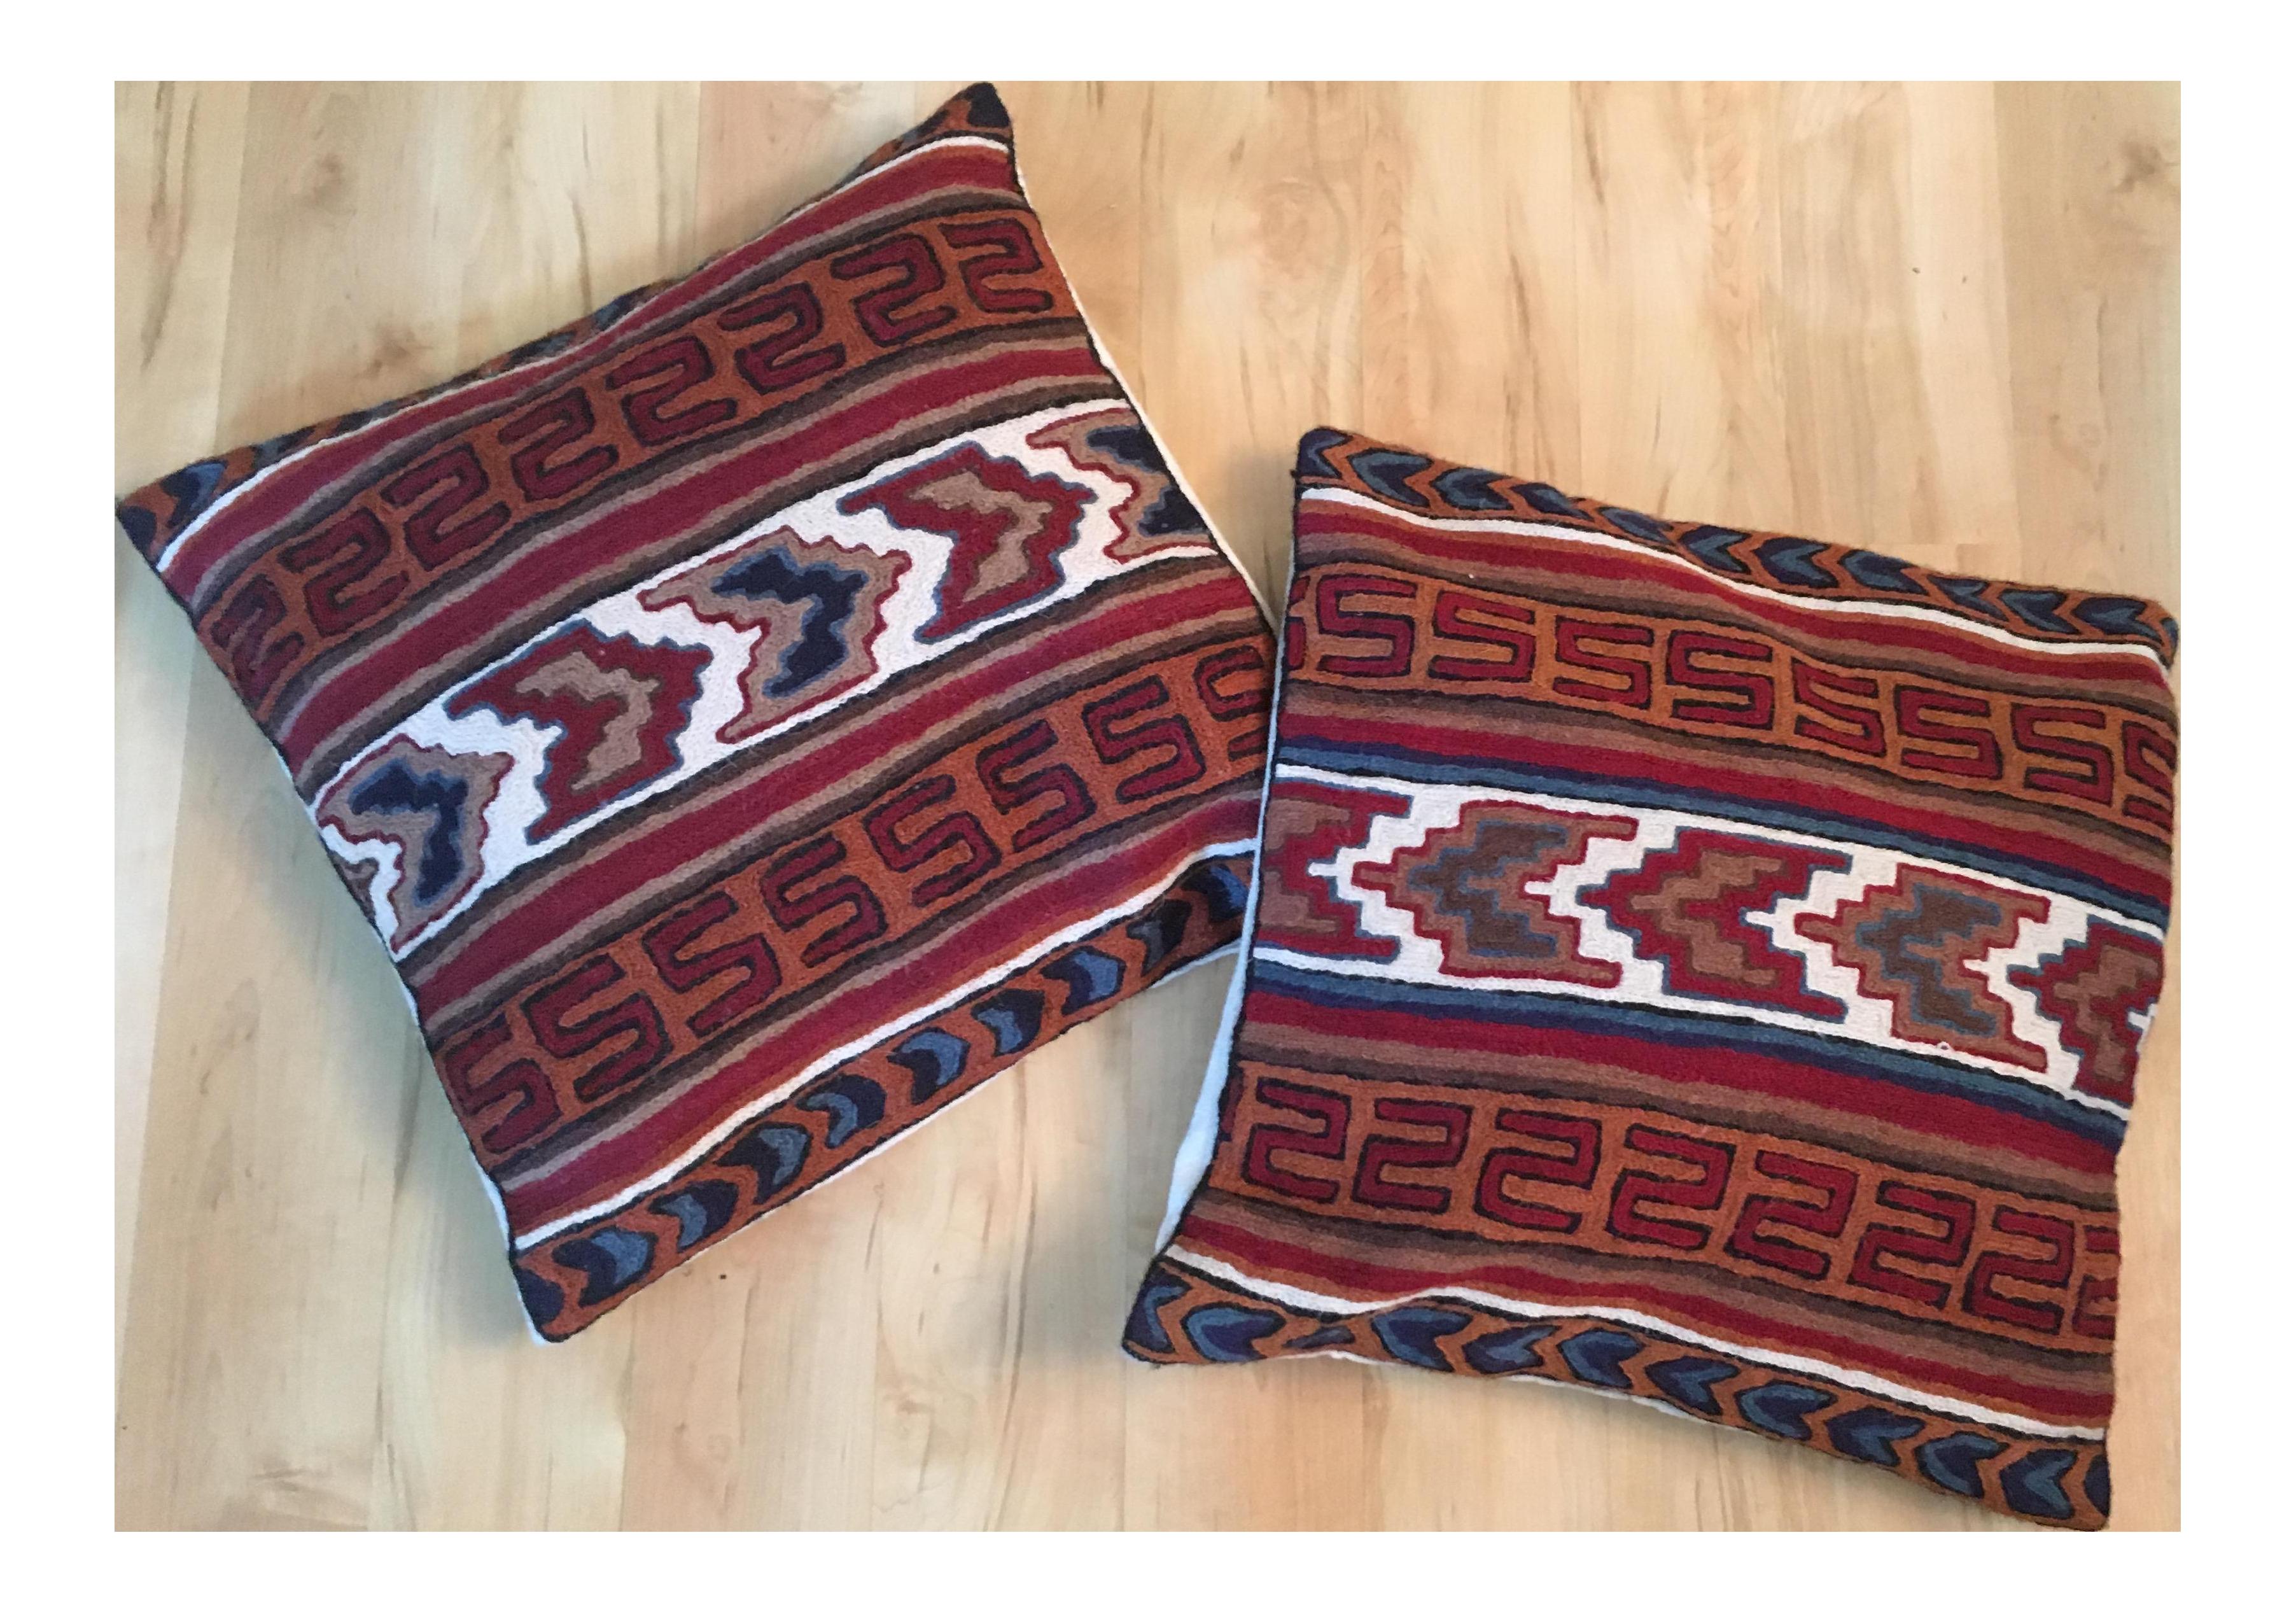 Vintage Southwestern Pillow : Vintage Southwestern Crewel Pillows - A Pair Chairish